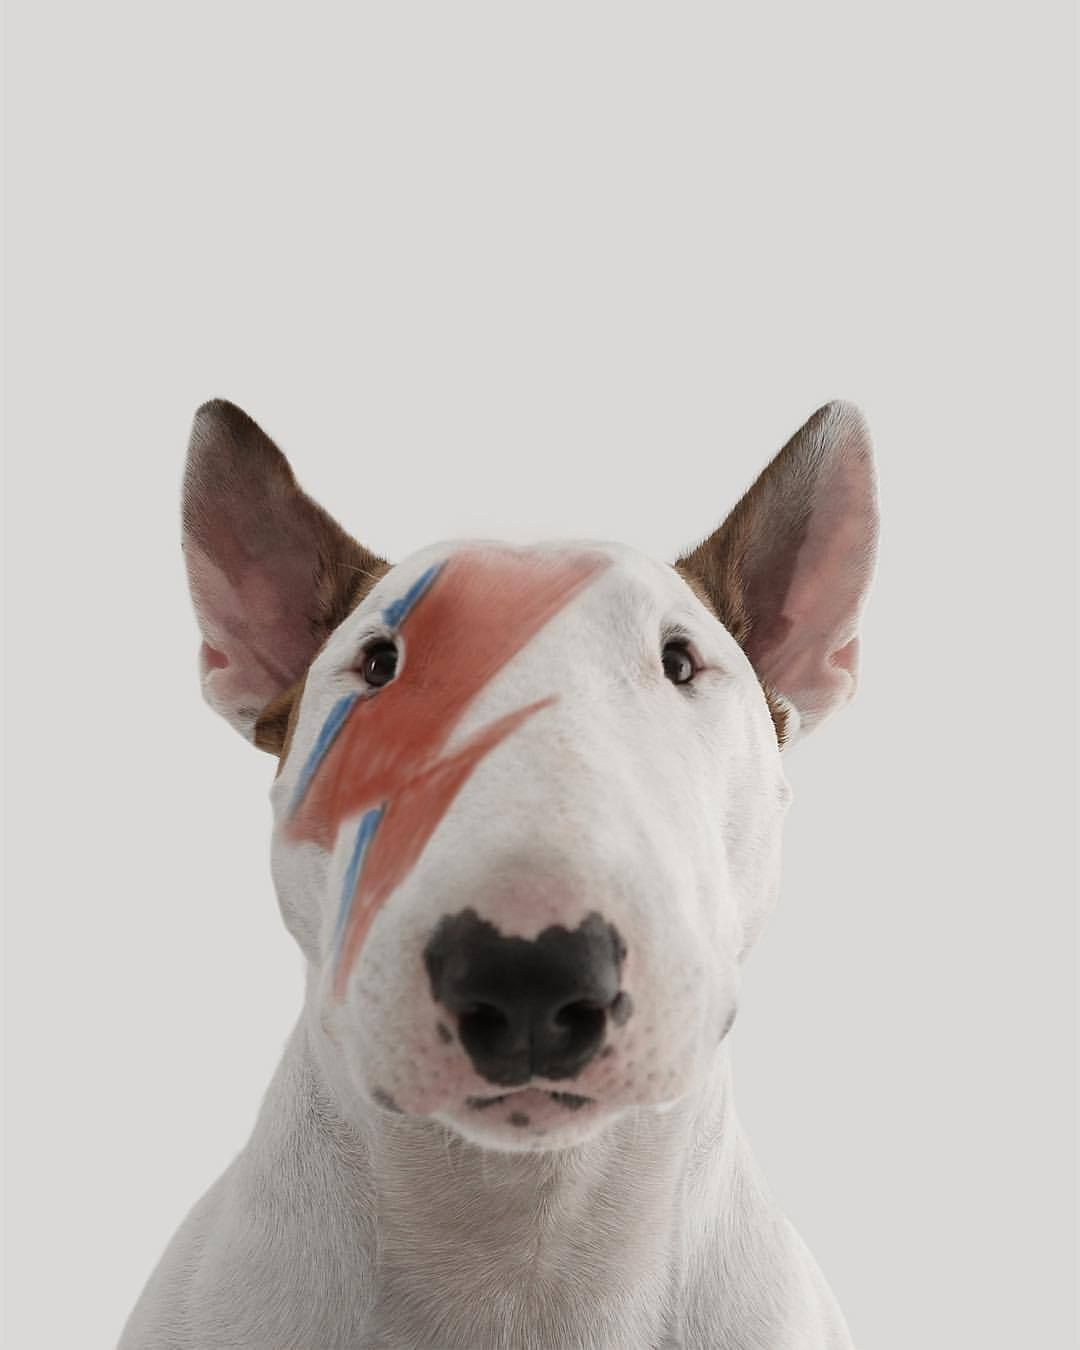 R I P David Bowie Bull Terrier Mascotas Bonitas Cuadros Del Perro